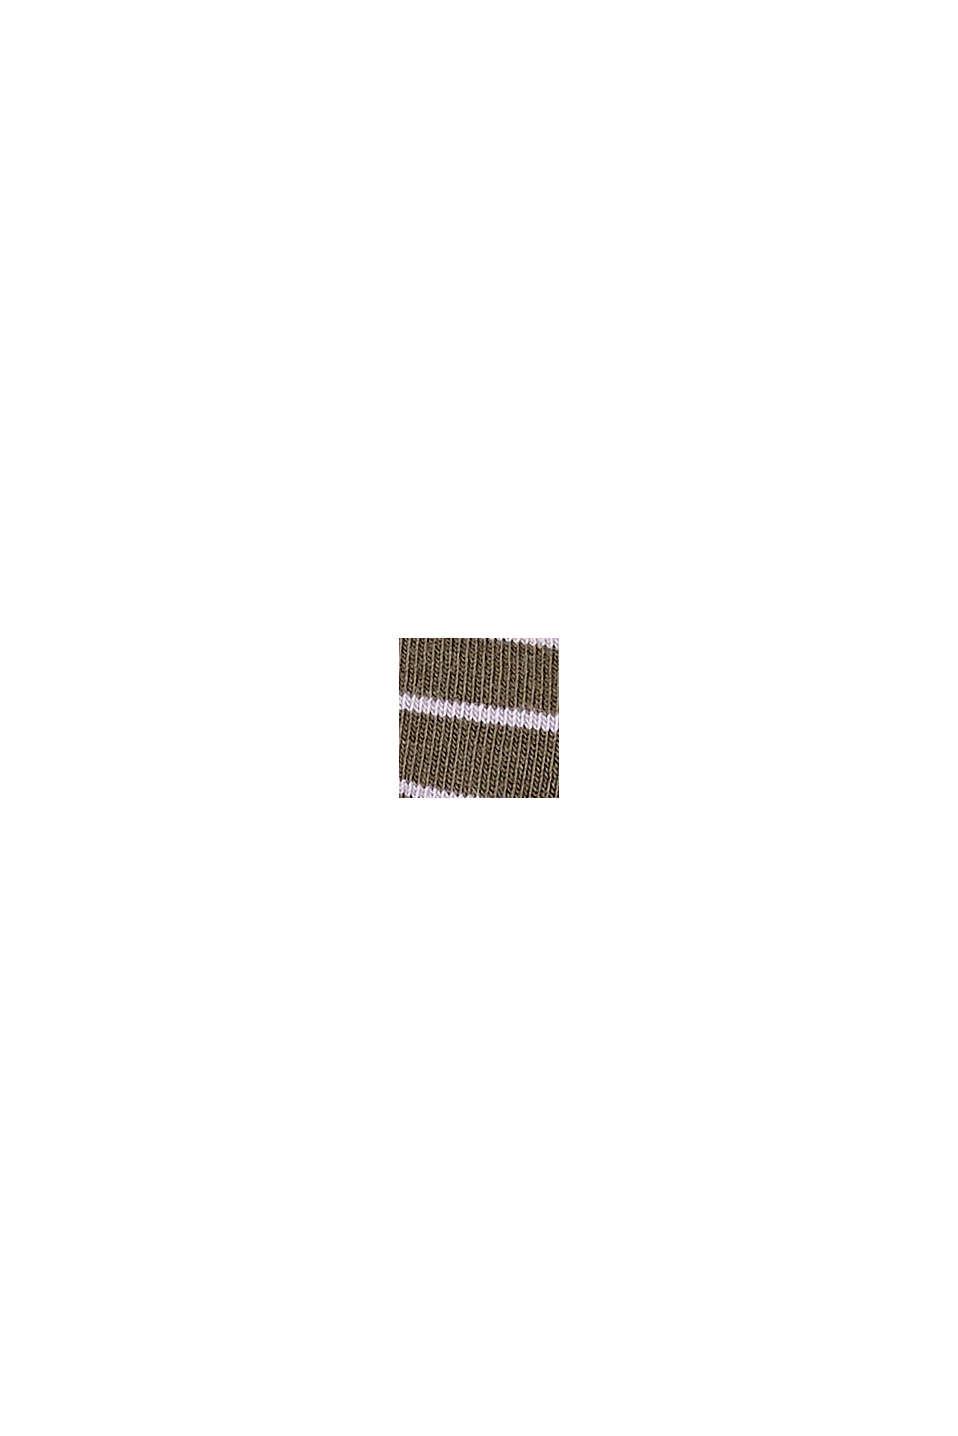 Pack de dos pared de calcetines hechos de algodón ecológico, MILITARY, swatch